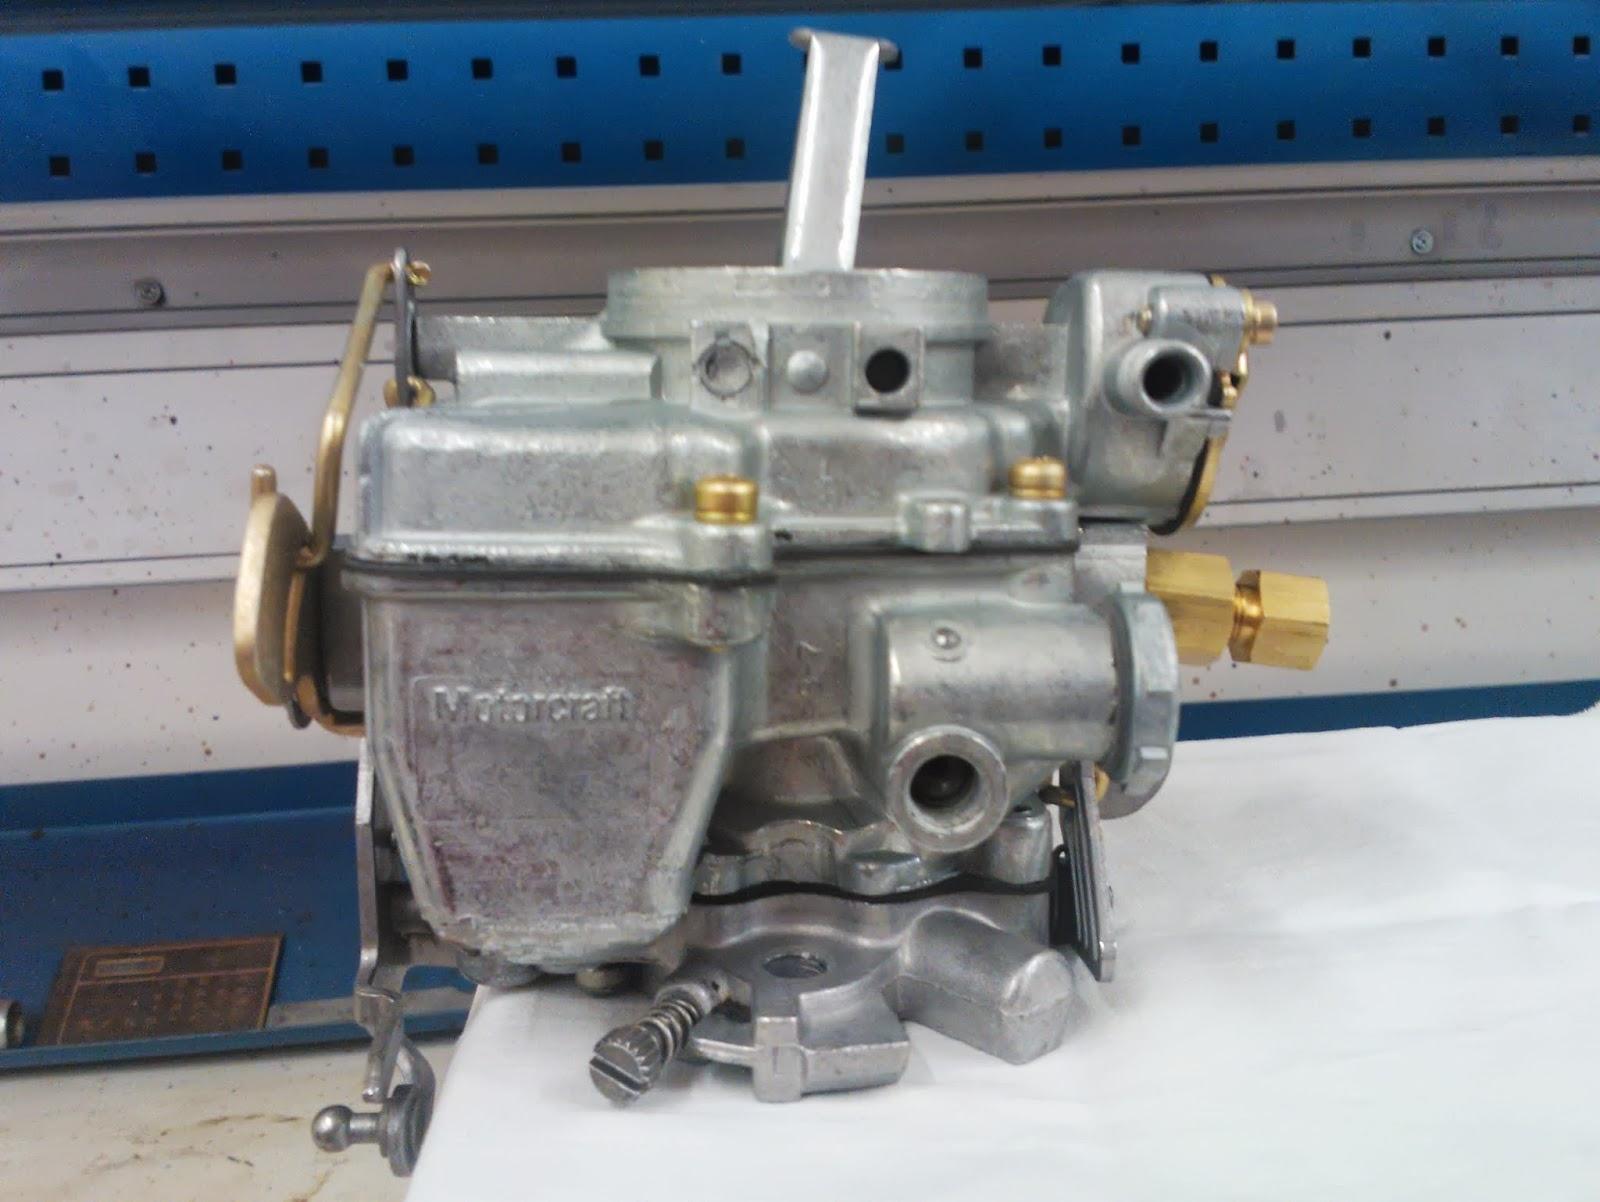 Spark Valve Diagram Great Design Of Wiring 2007 Uplander Engine Chevy Tbi Fuel Inlet Location Vacuum Regulator Pontiac G6 Parts